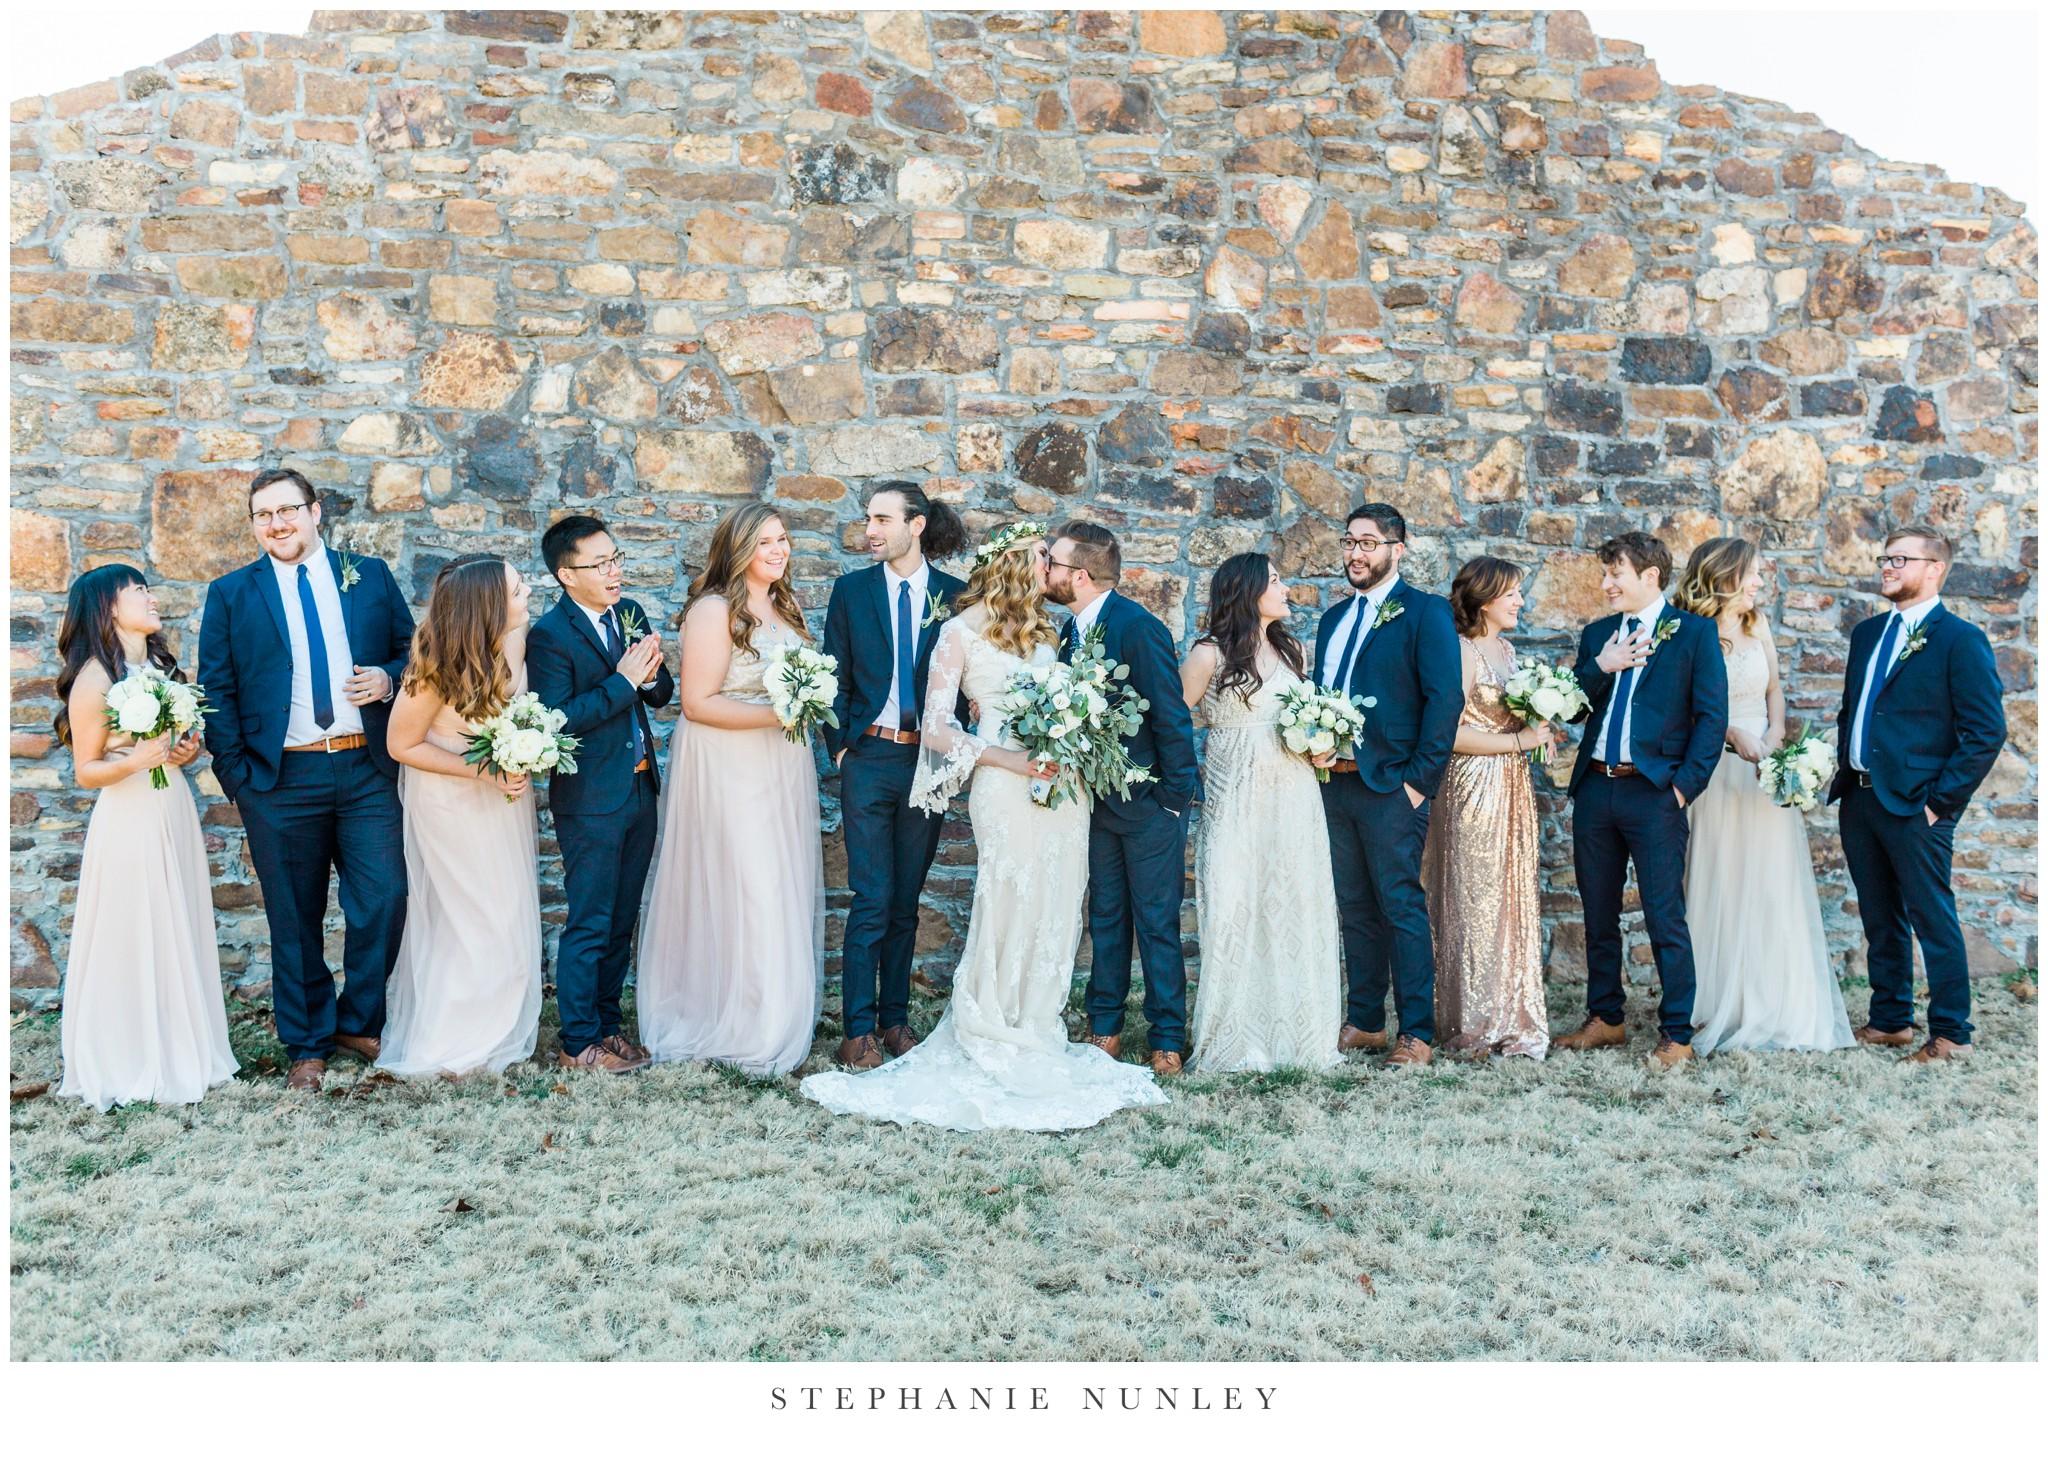 sassafrass-springs-vineyard-film-wedding-photos-45.jpg